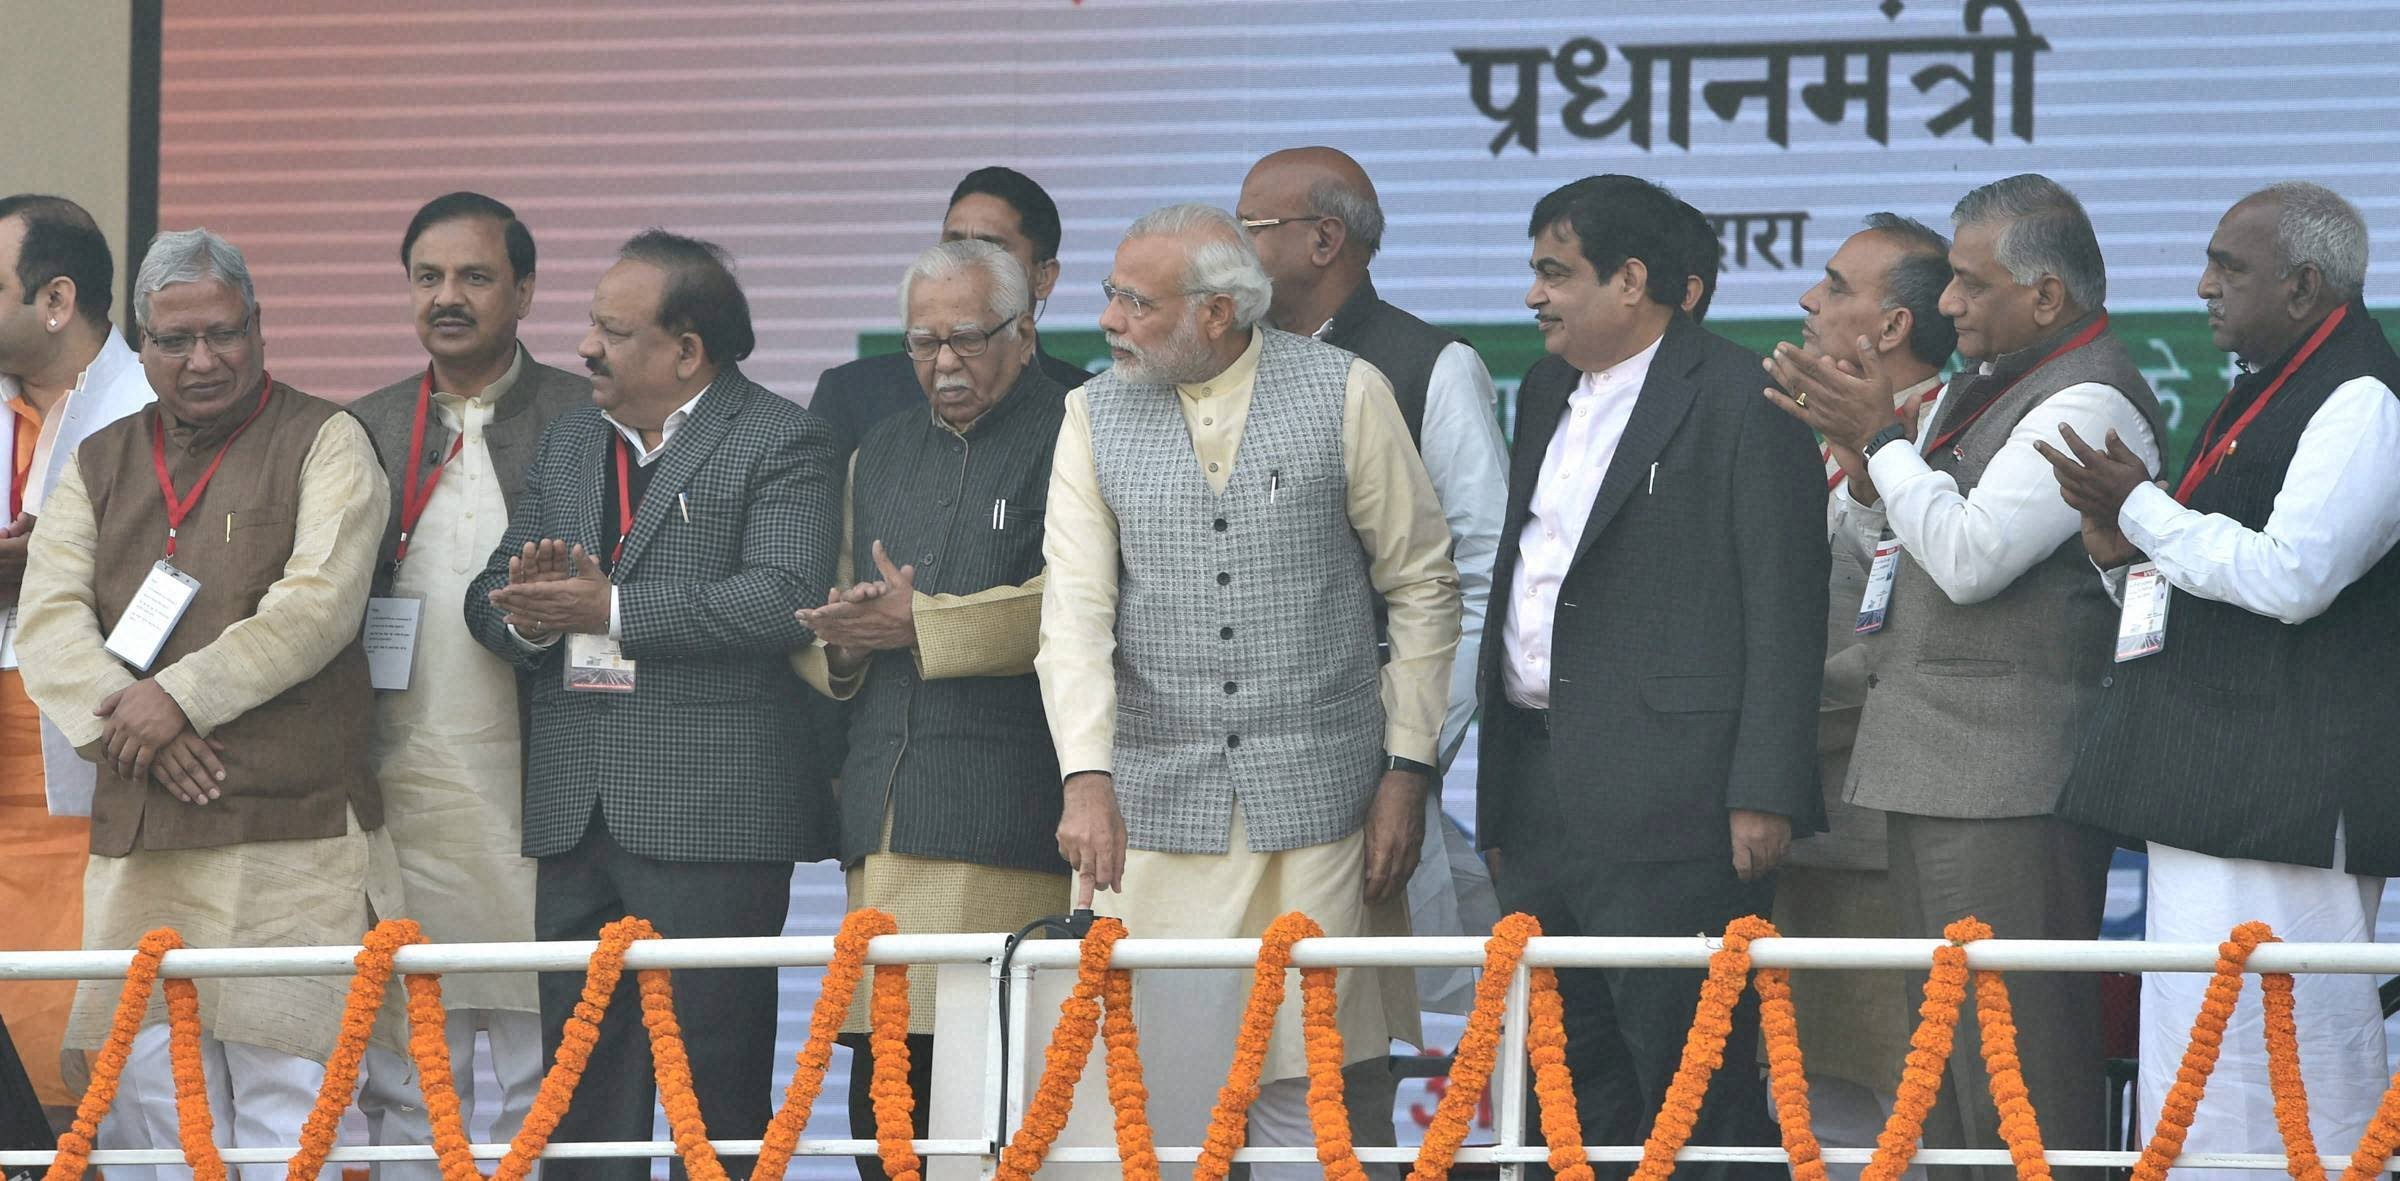 PM Narendra Modi,Delhi-Meerut Expressway,Eastern Peripheral Expressway,Nitin Gadkari,Meerut,Electronic Toll Collection,Baghpat, Modi Roadshow,Union Transport Minister,